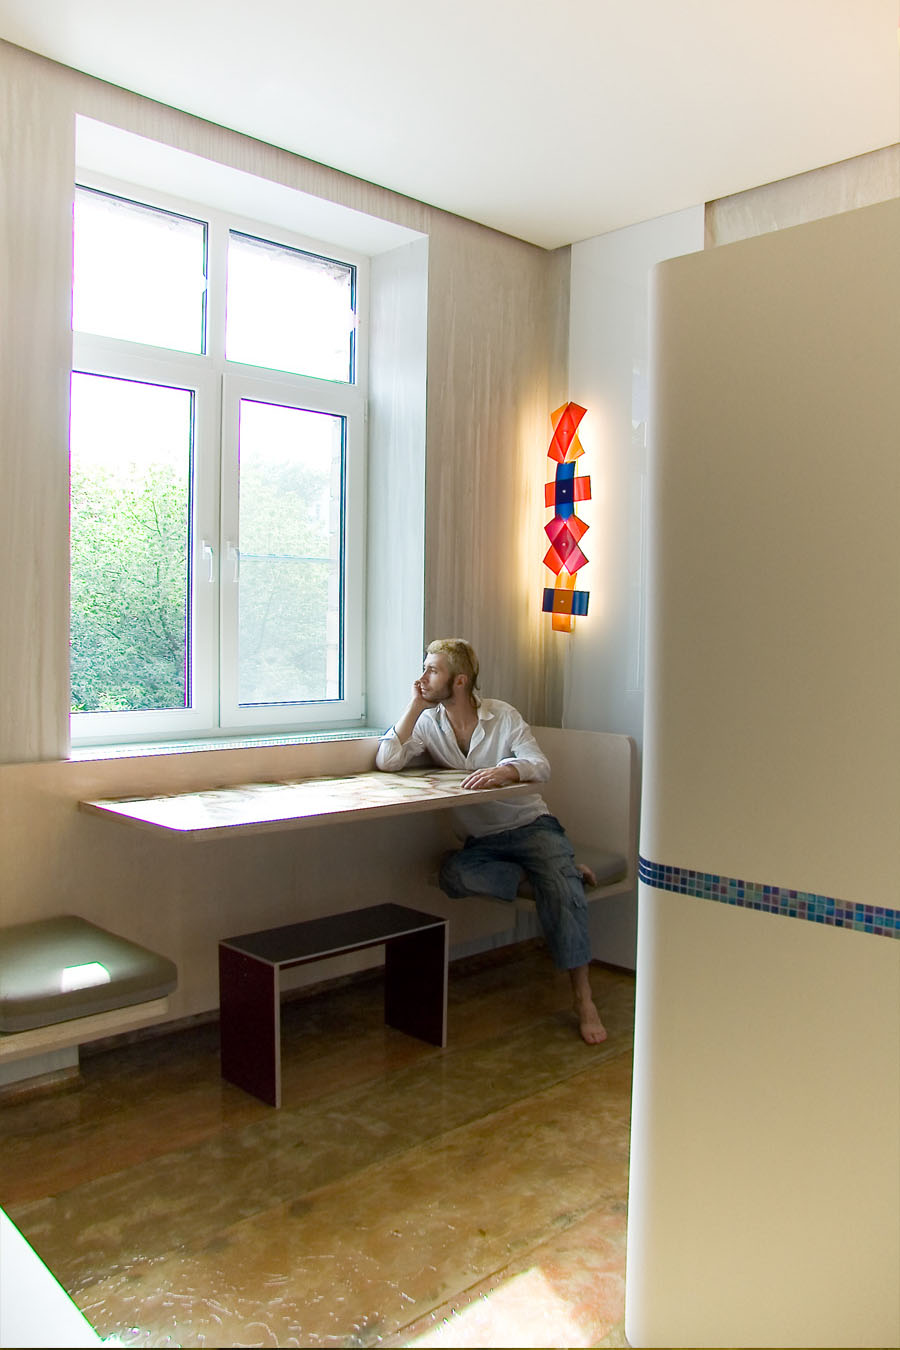 Freydenberg_Apartment_Hotel_33.jpg